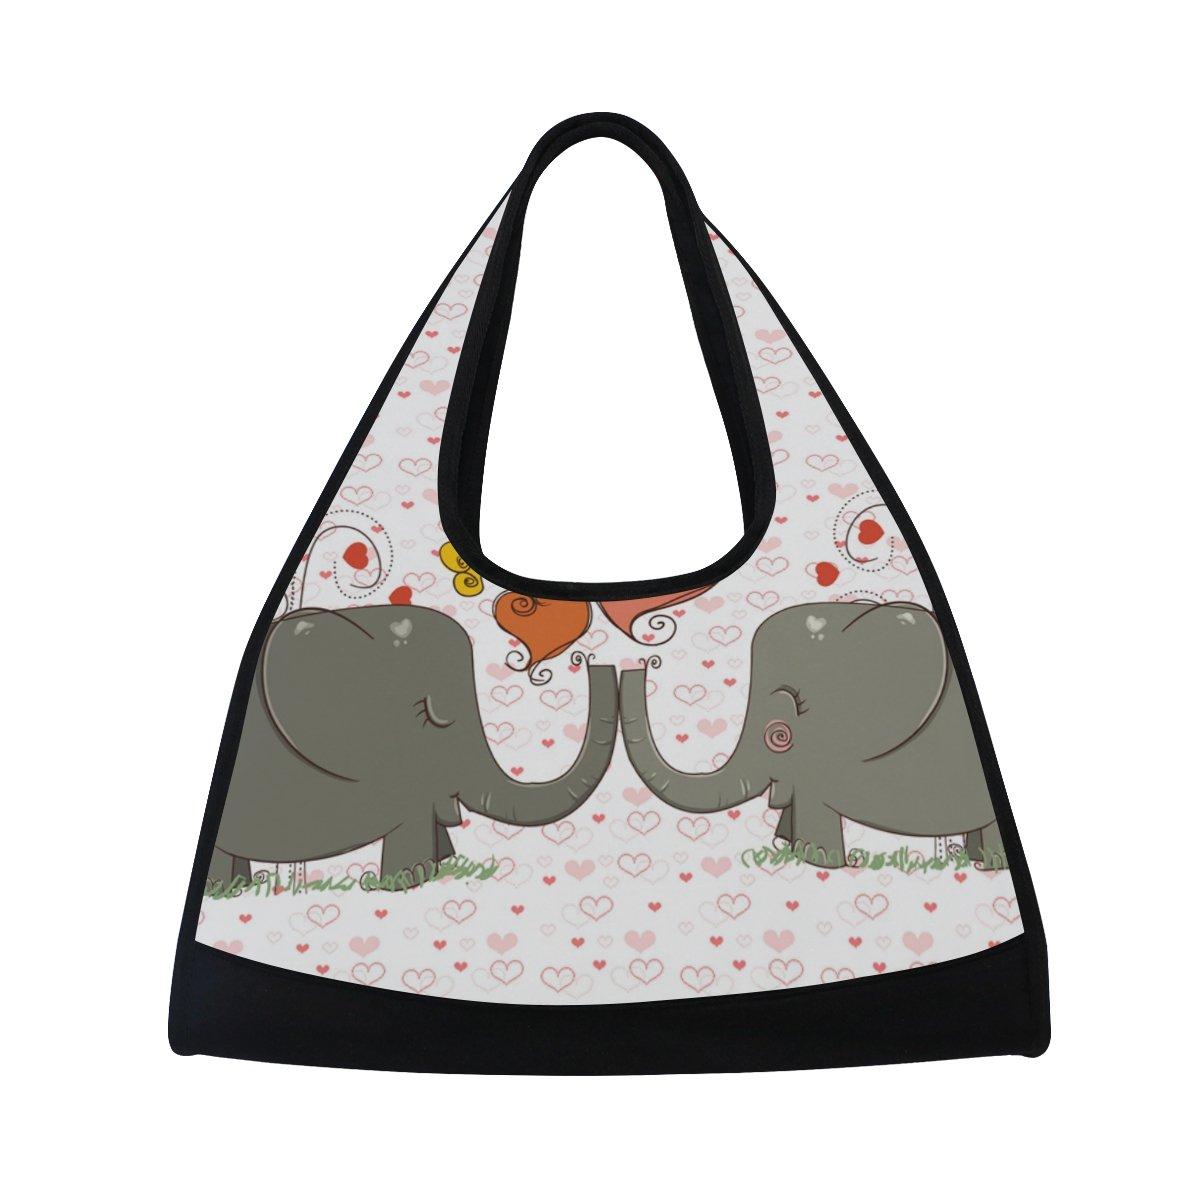 AHOMY Sports Gym Bag Elephant Love Heart Duffel Bag Travel Shoulder Bag by AHOMY (Image #1)